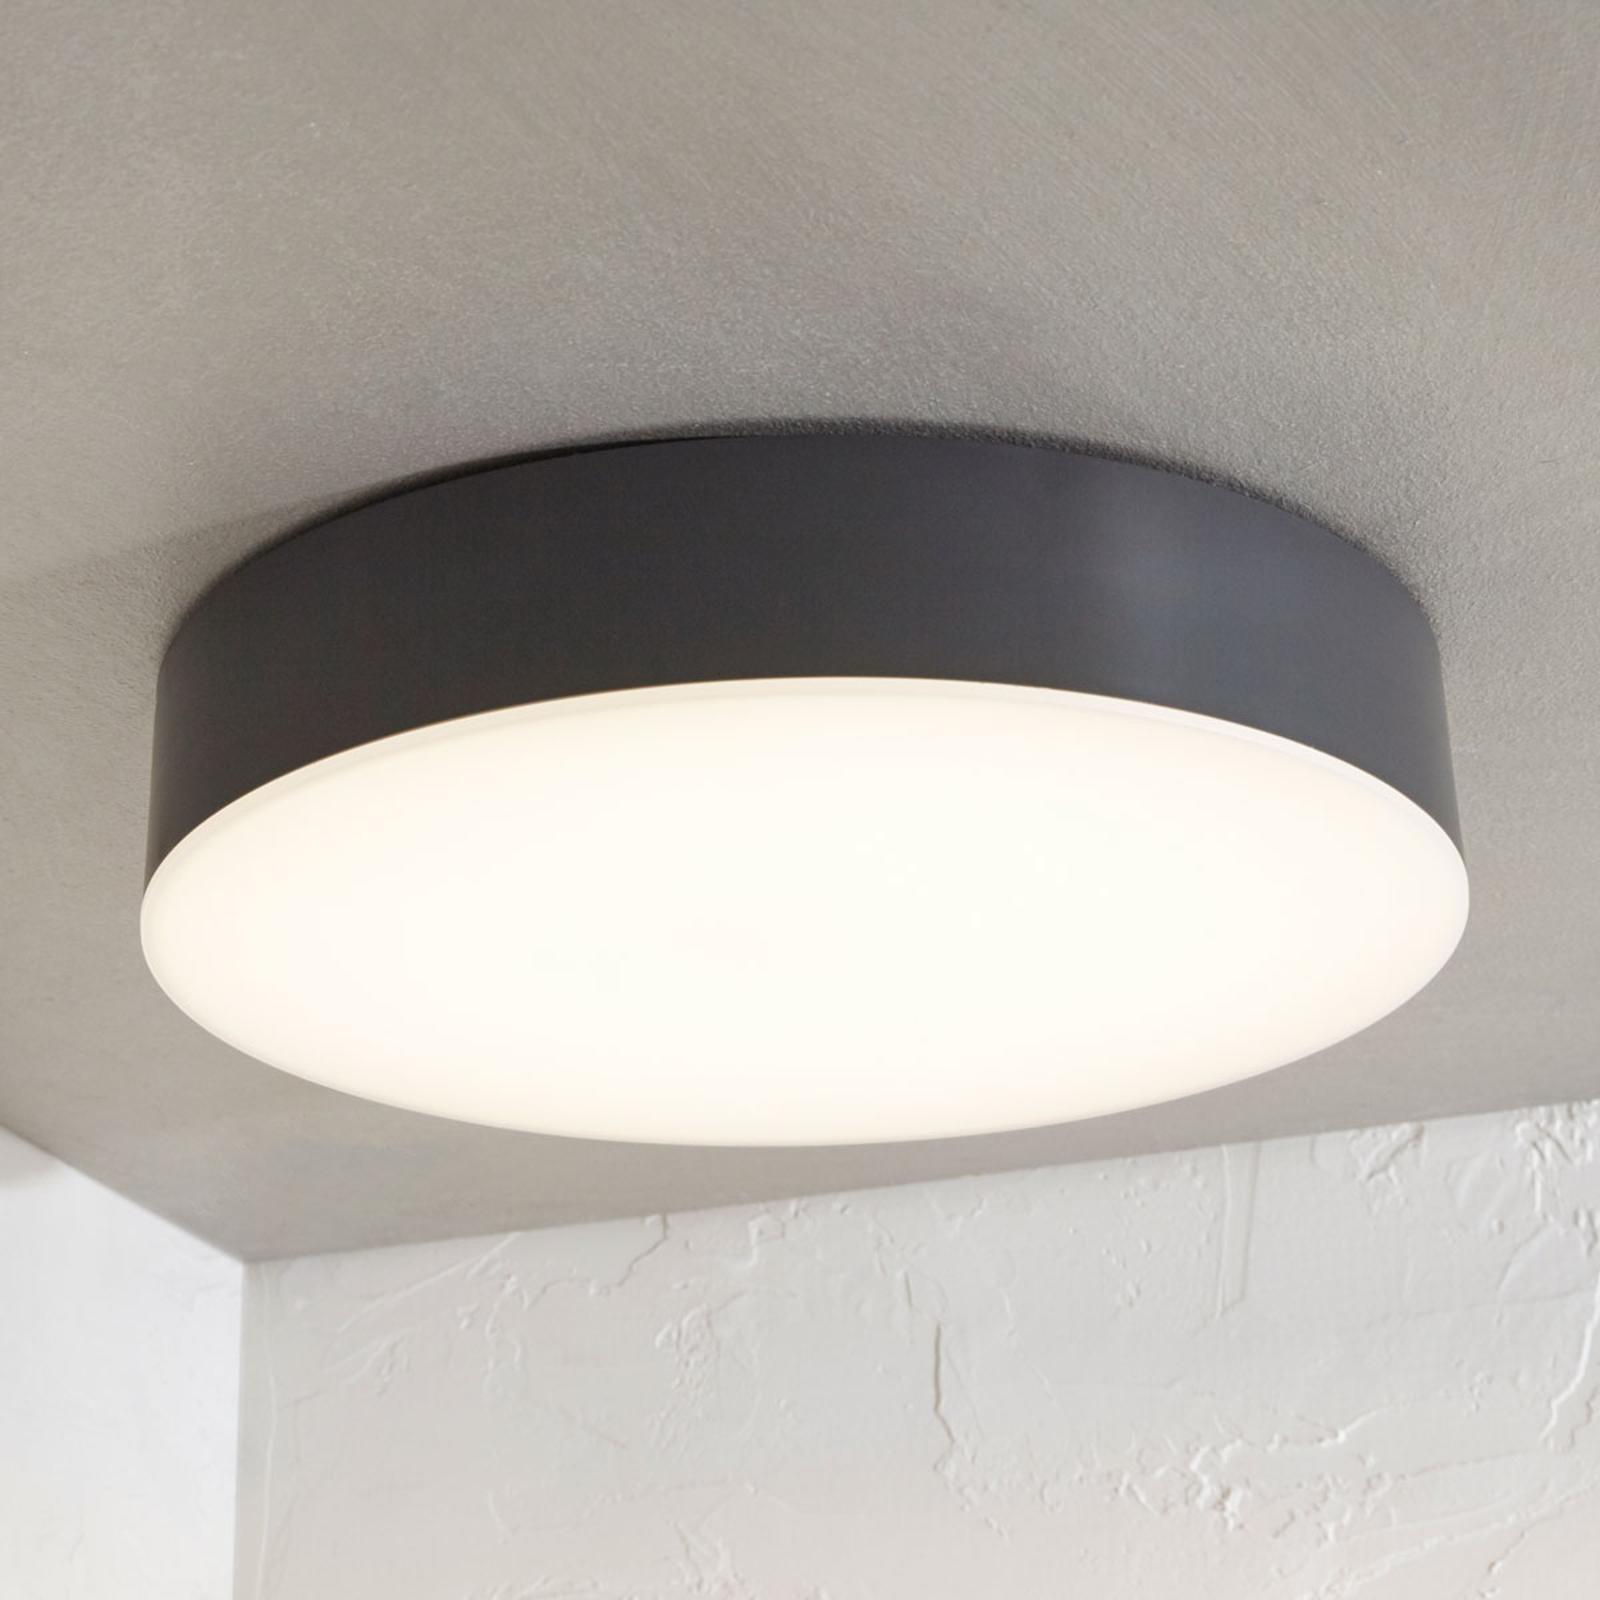 Lampa sufitowa LED Lyam, IP65, ciemnoszara